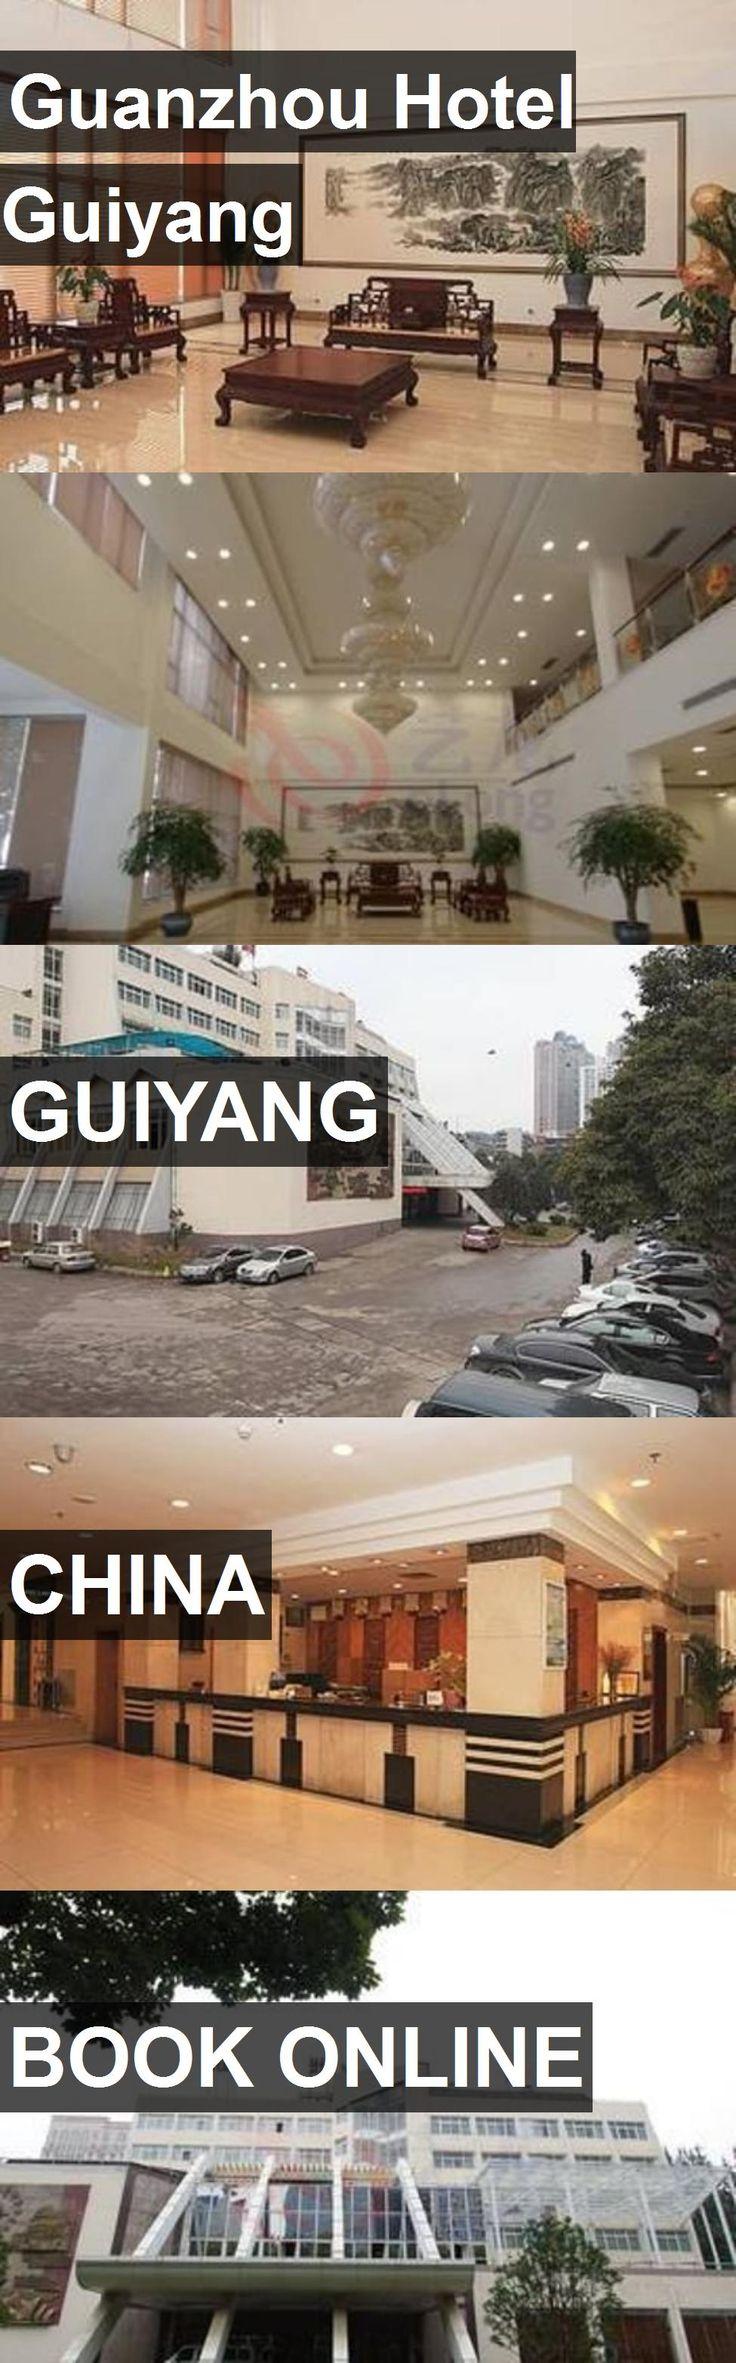 Hotel Guanzhou Hotel Guiyang in Guiyang, China. For more information, photos, reviews and best prices please follow the link. #China #Guiyang #GuanzhouHotelGuiyang #hotel #travel #vacation